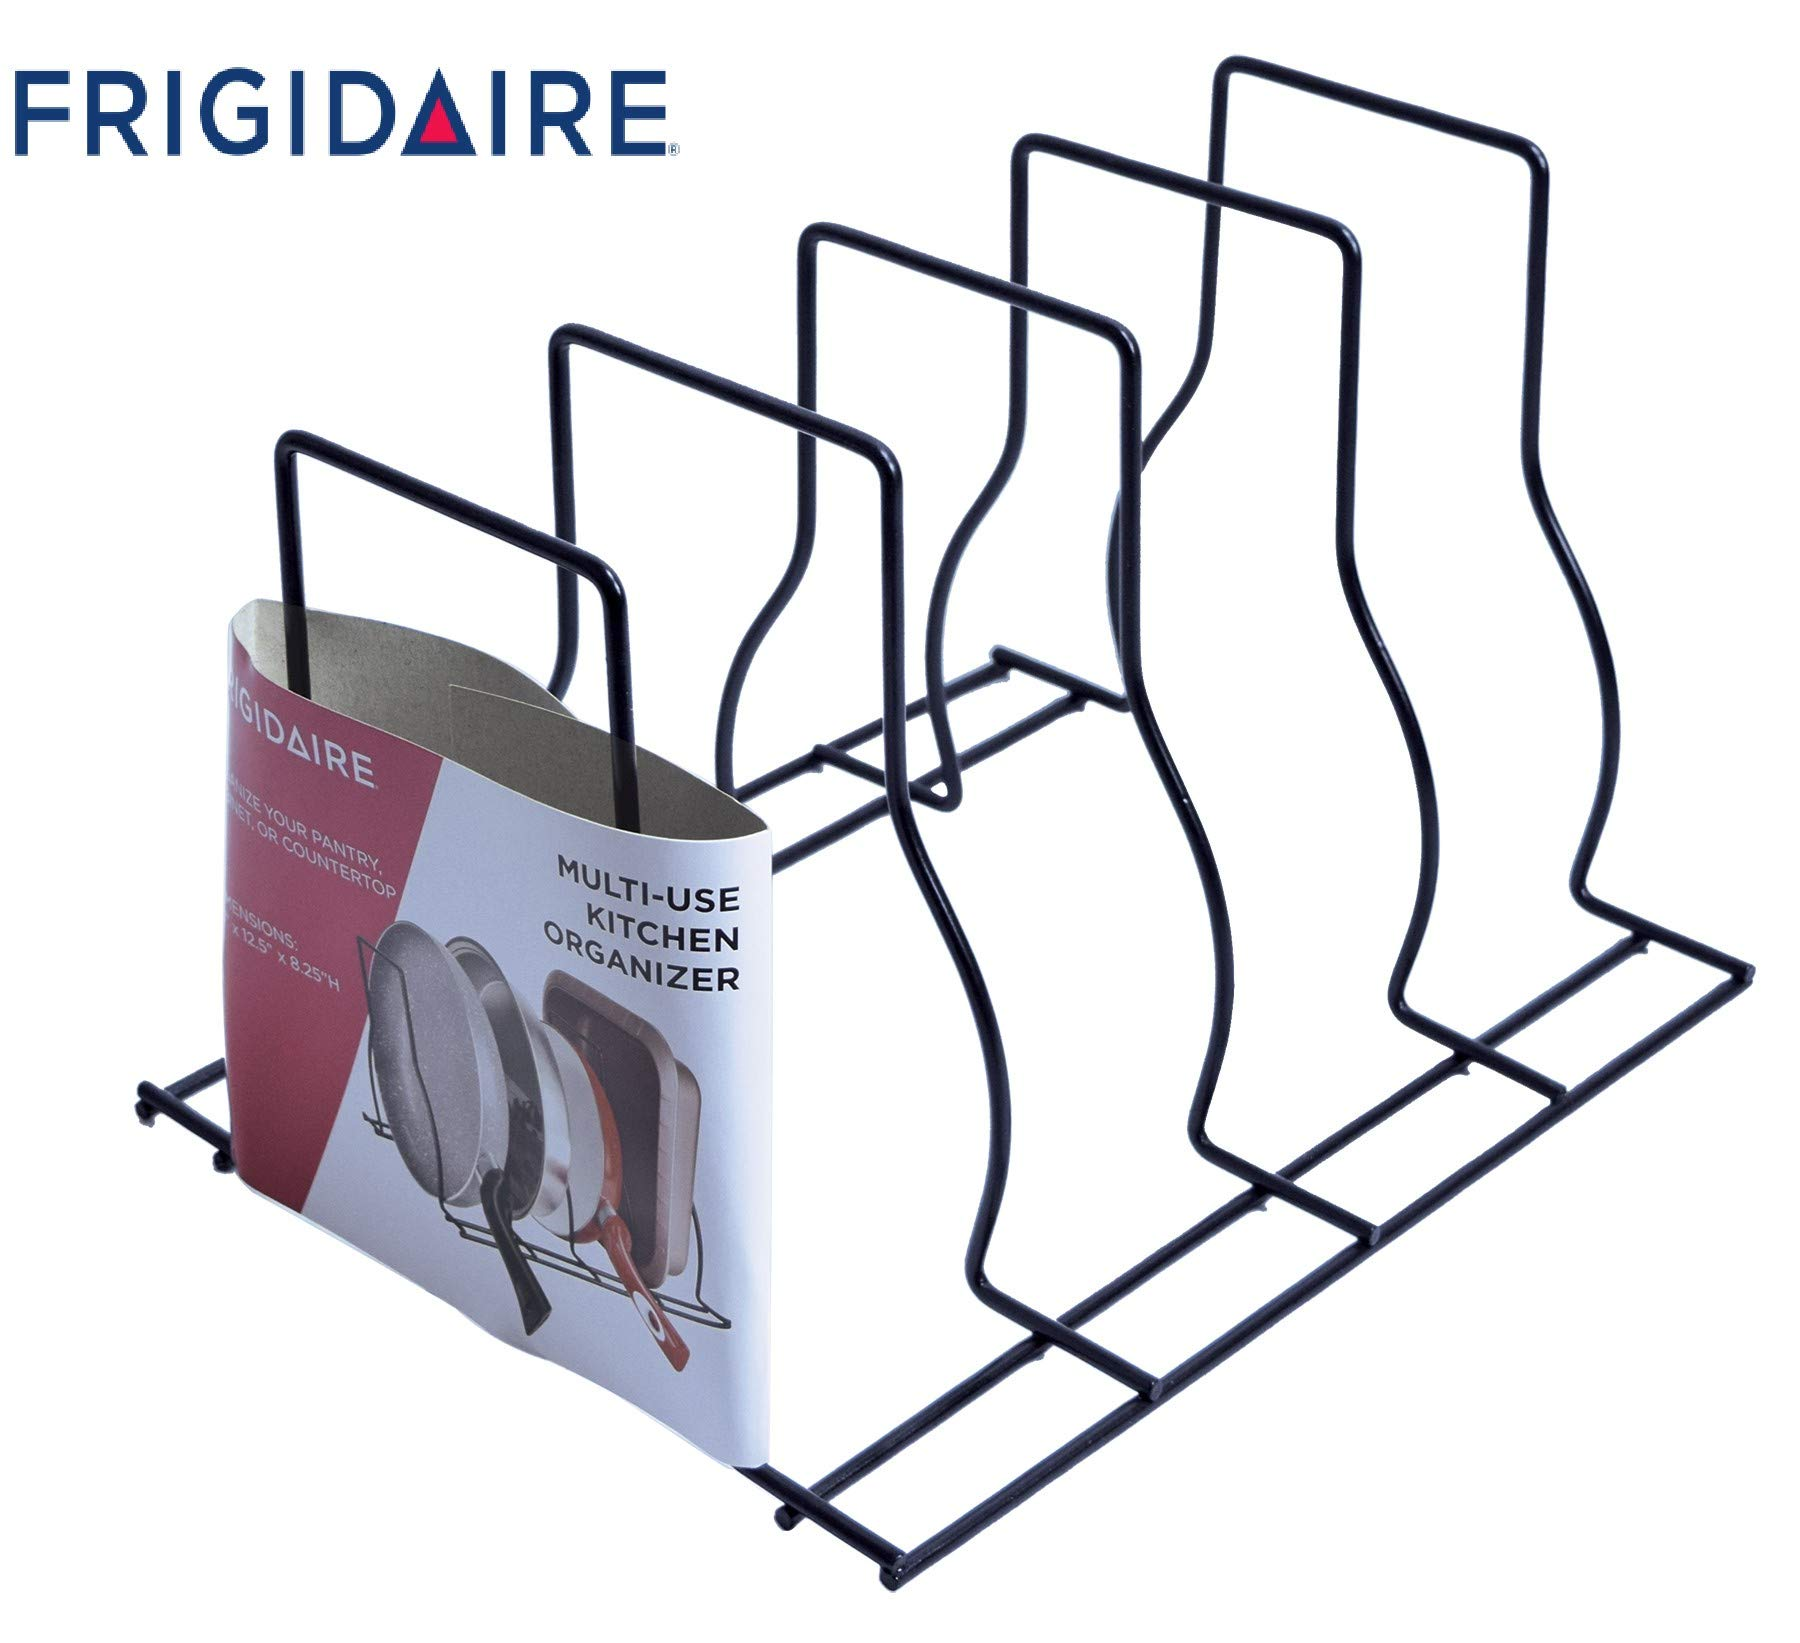 Frigidaire Brand Metal Pot and Lid Organizer Multifunction Kitchen & Pantry Storage Black